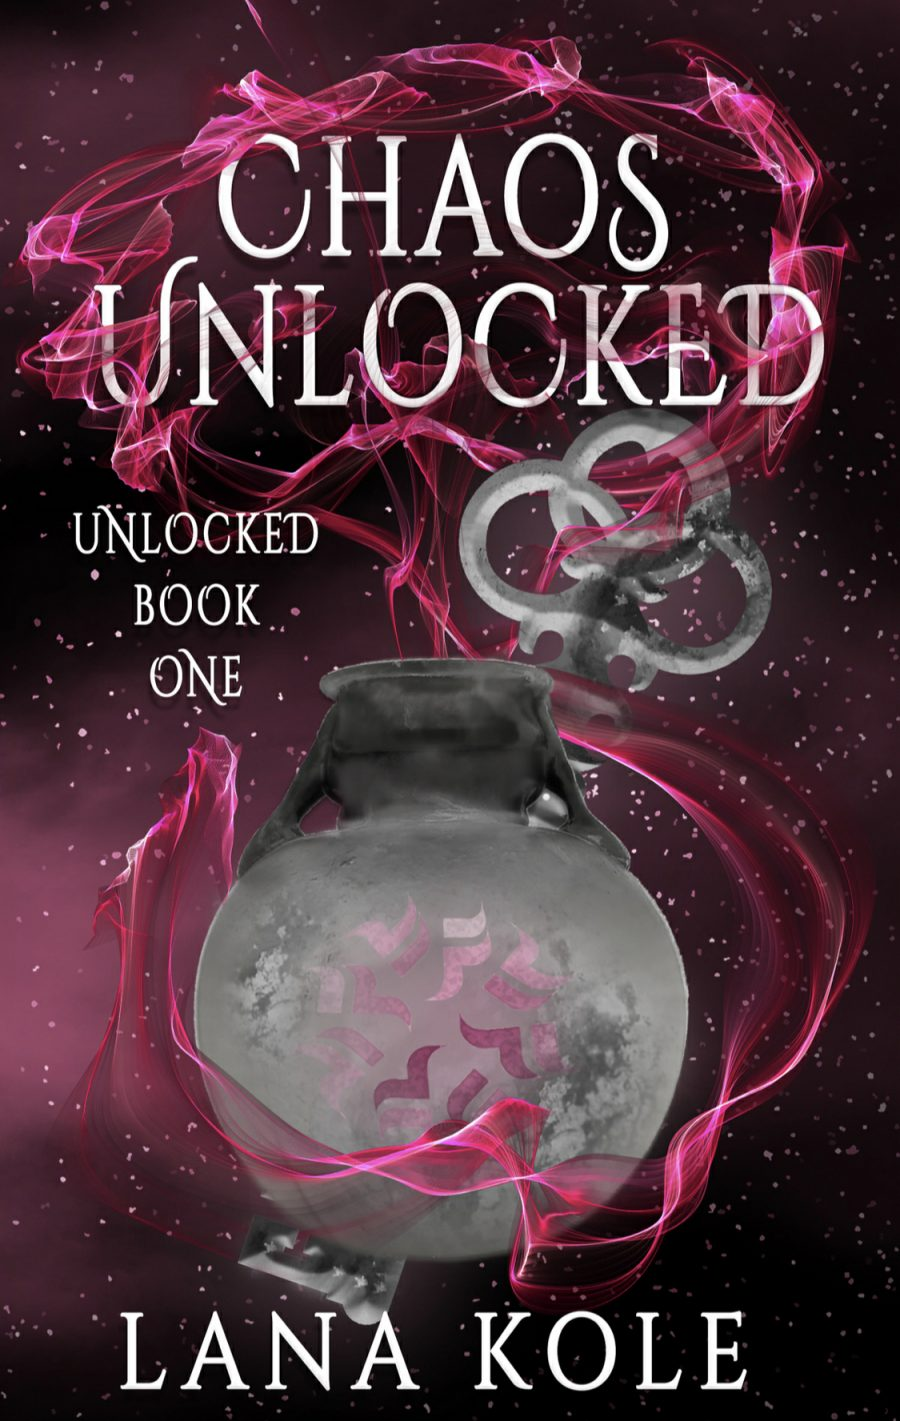 Chaos Unlocked by Lana Kole - A Book Review #SlowBurn #MediumBurn #PNR #RH #ReverseHarem #WhyChoose #Demons #Cult #KindleUnlimited #KU